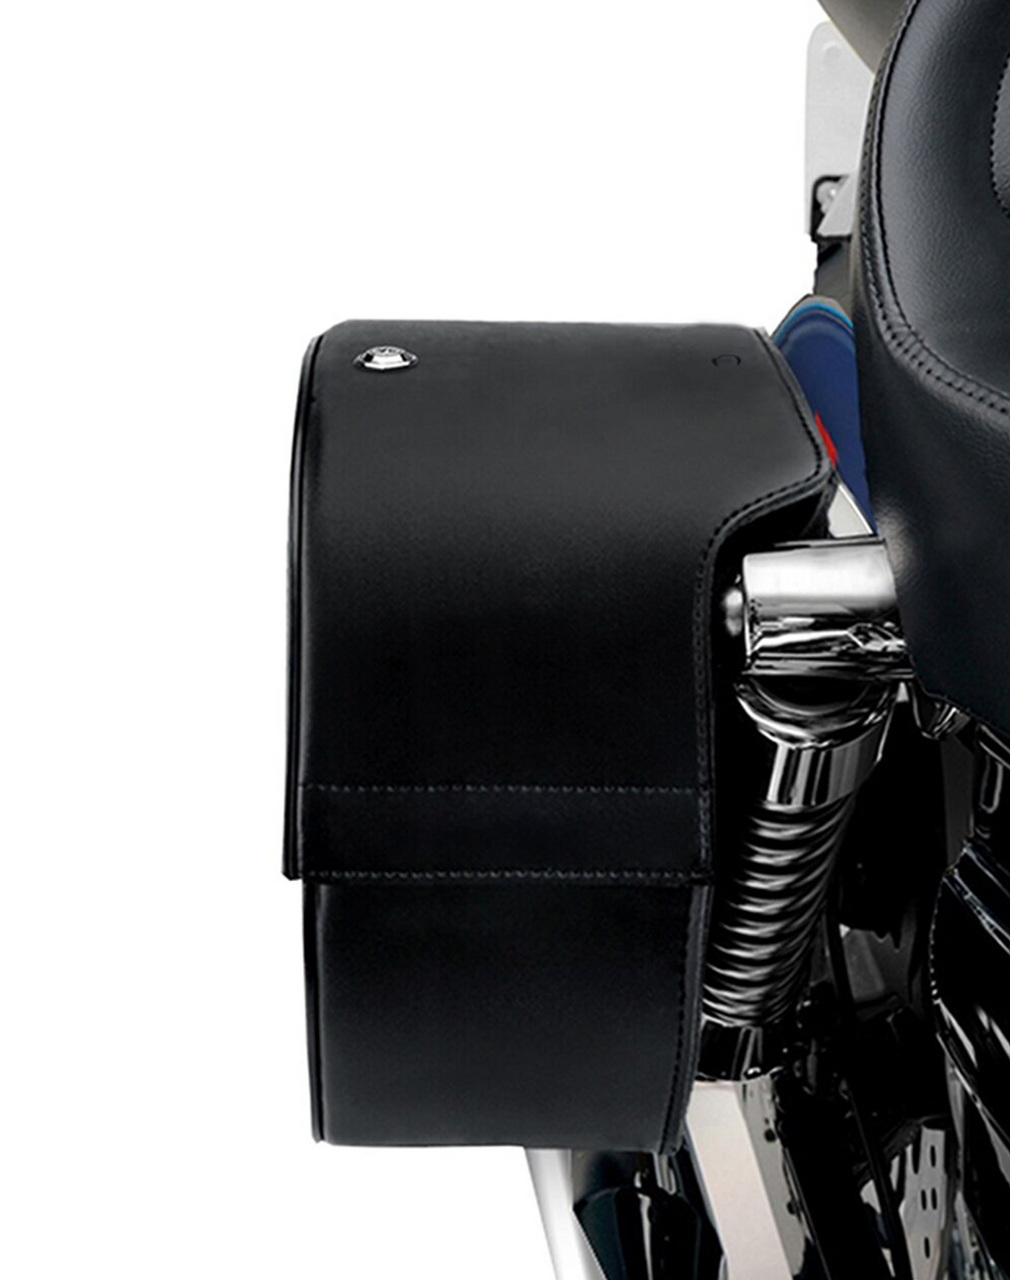 Honda 750 Shadow Phantom Charger Side Pocket With Shock Cutout Motorcycle Saddlebags shock cutout view